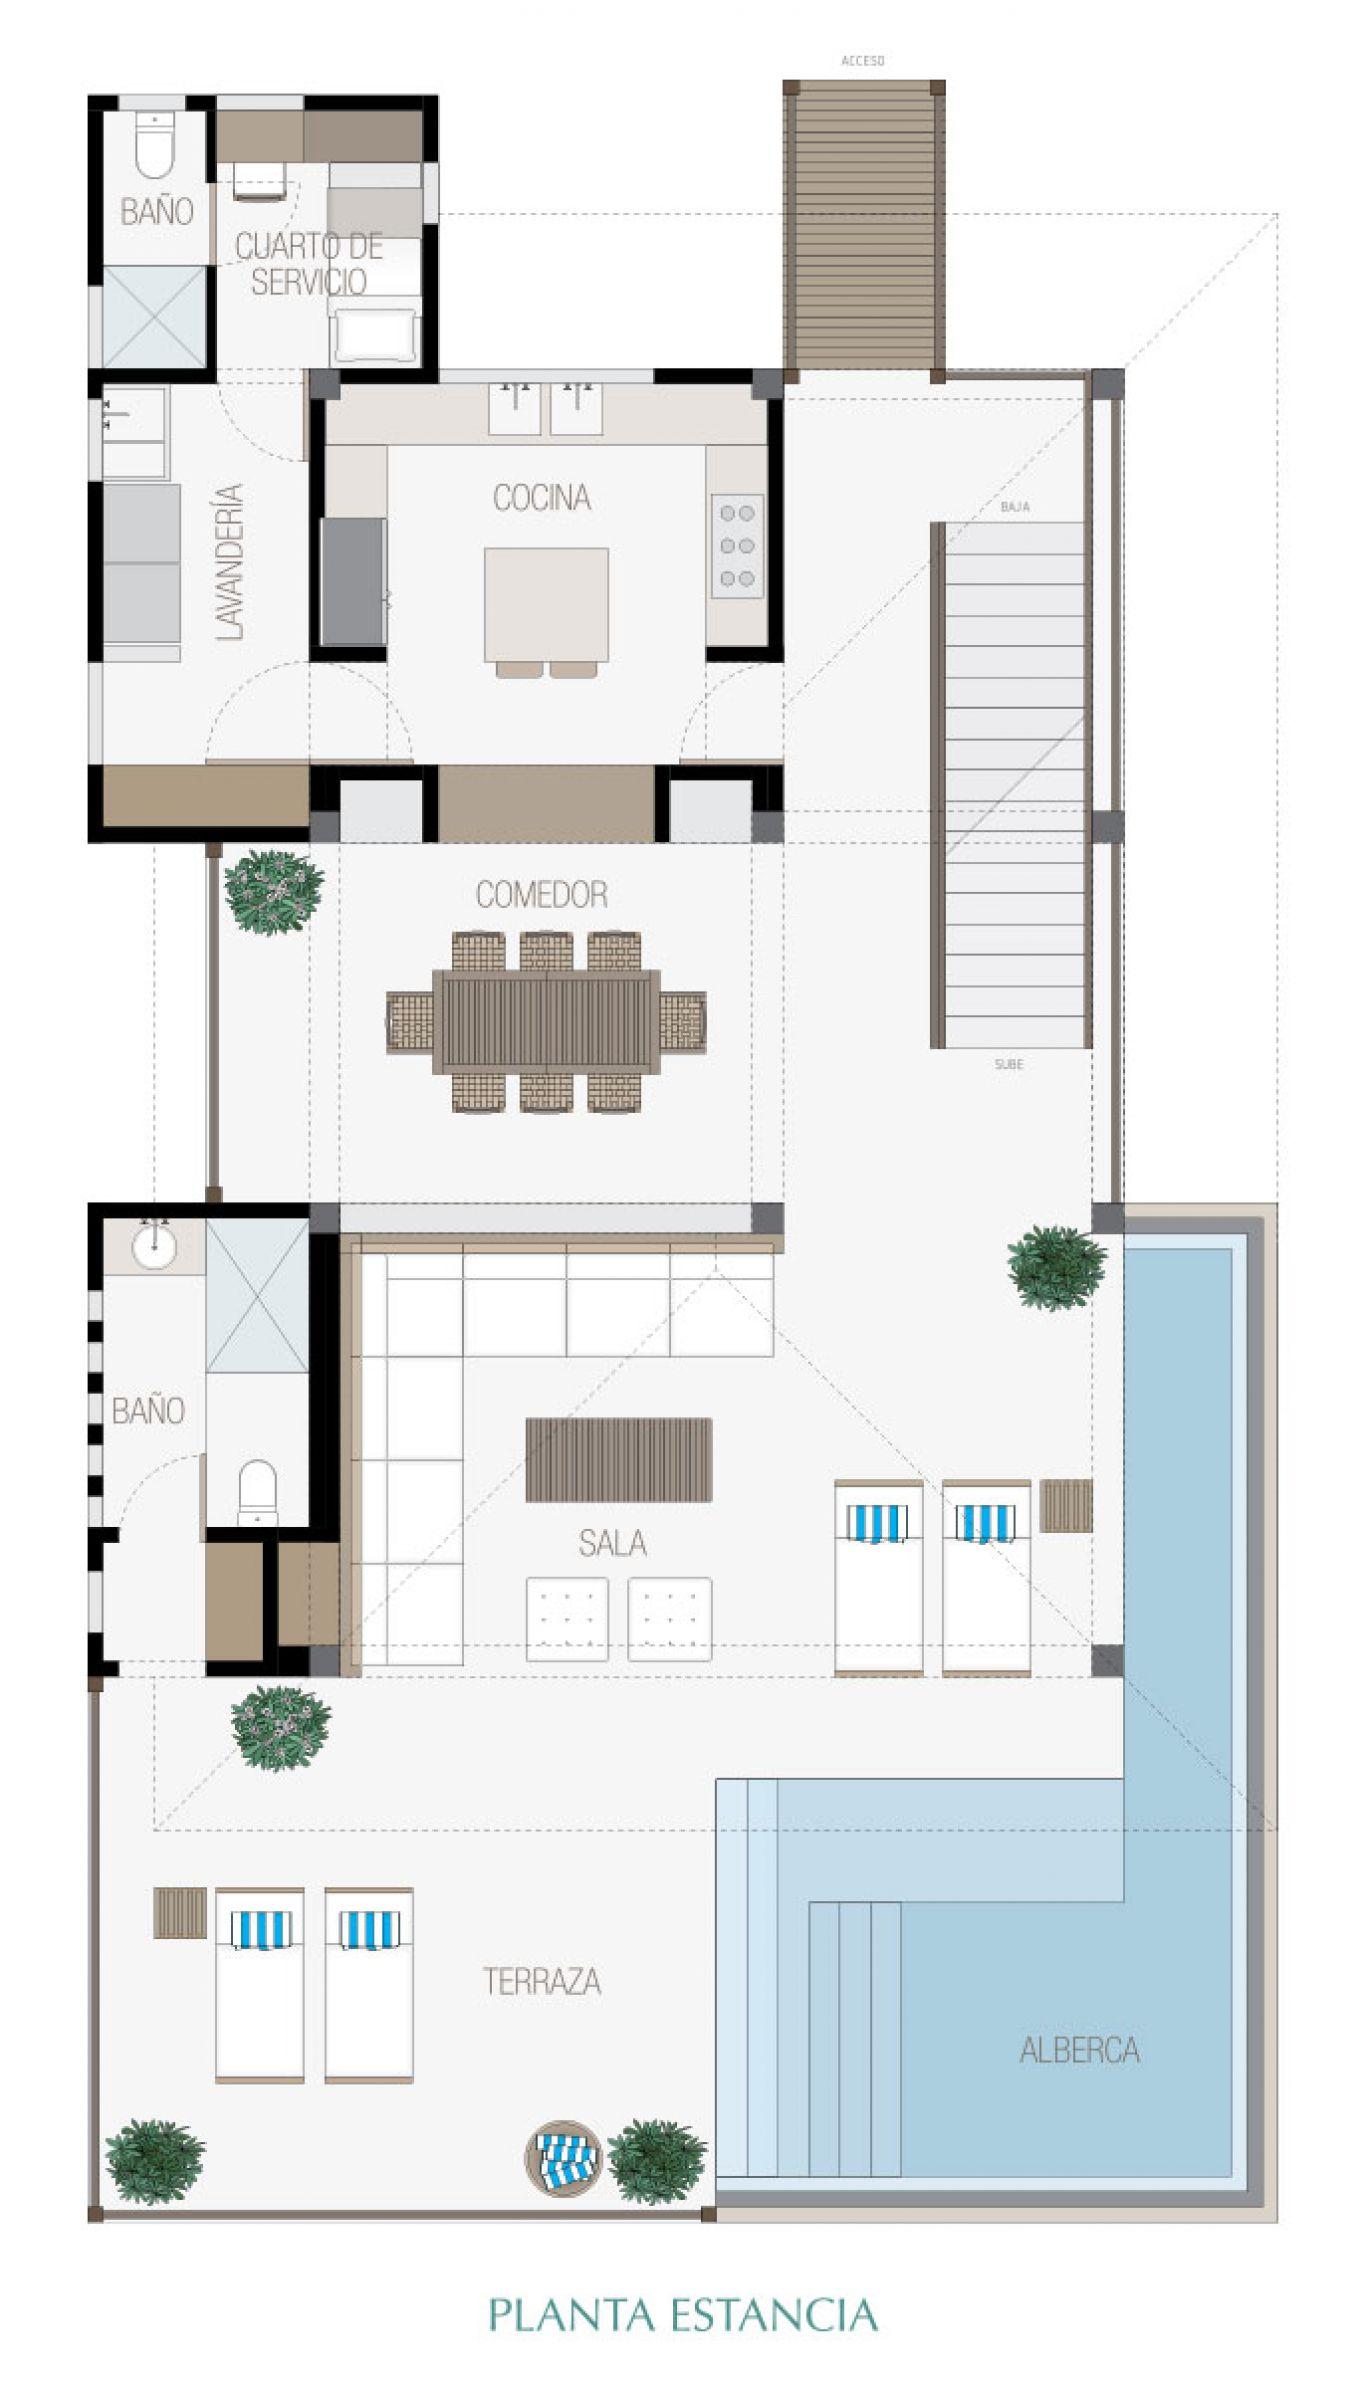 Manai, id 1519068, no 4, plano de villa 4, 296